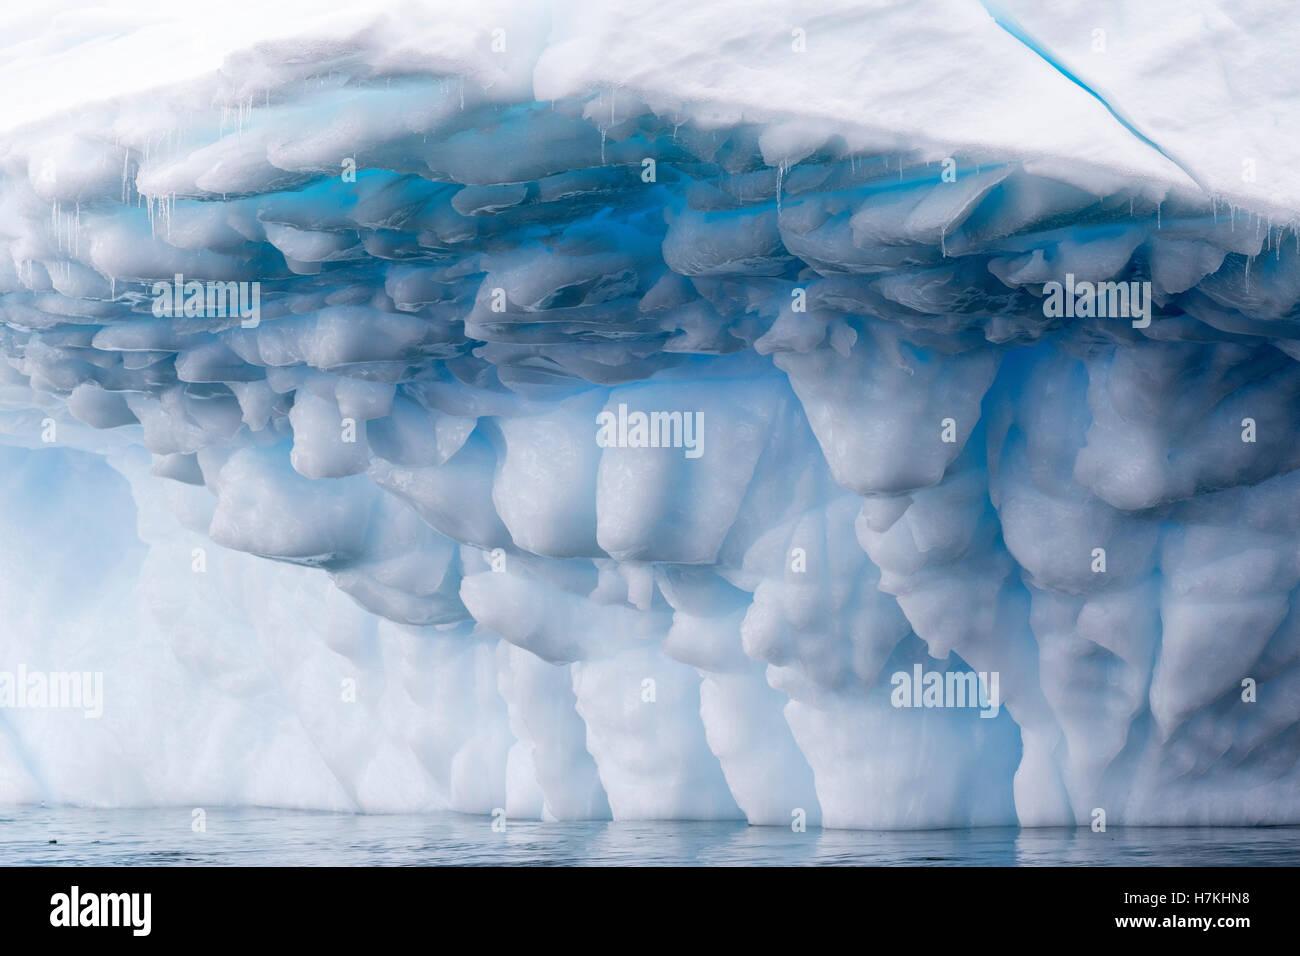 Antarctica blue iceberg, ice berg, floats in Antarctica landscape of ice. - Stock Image